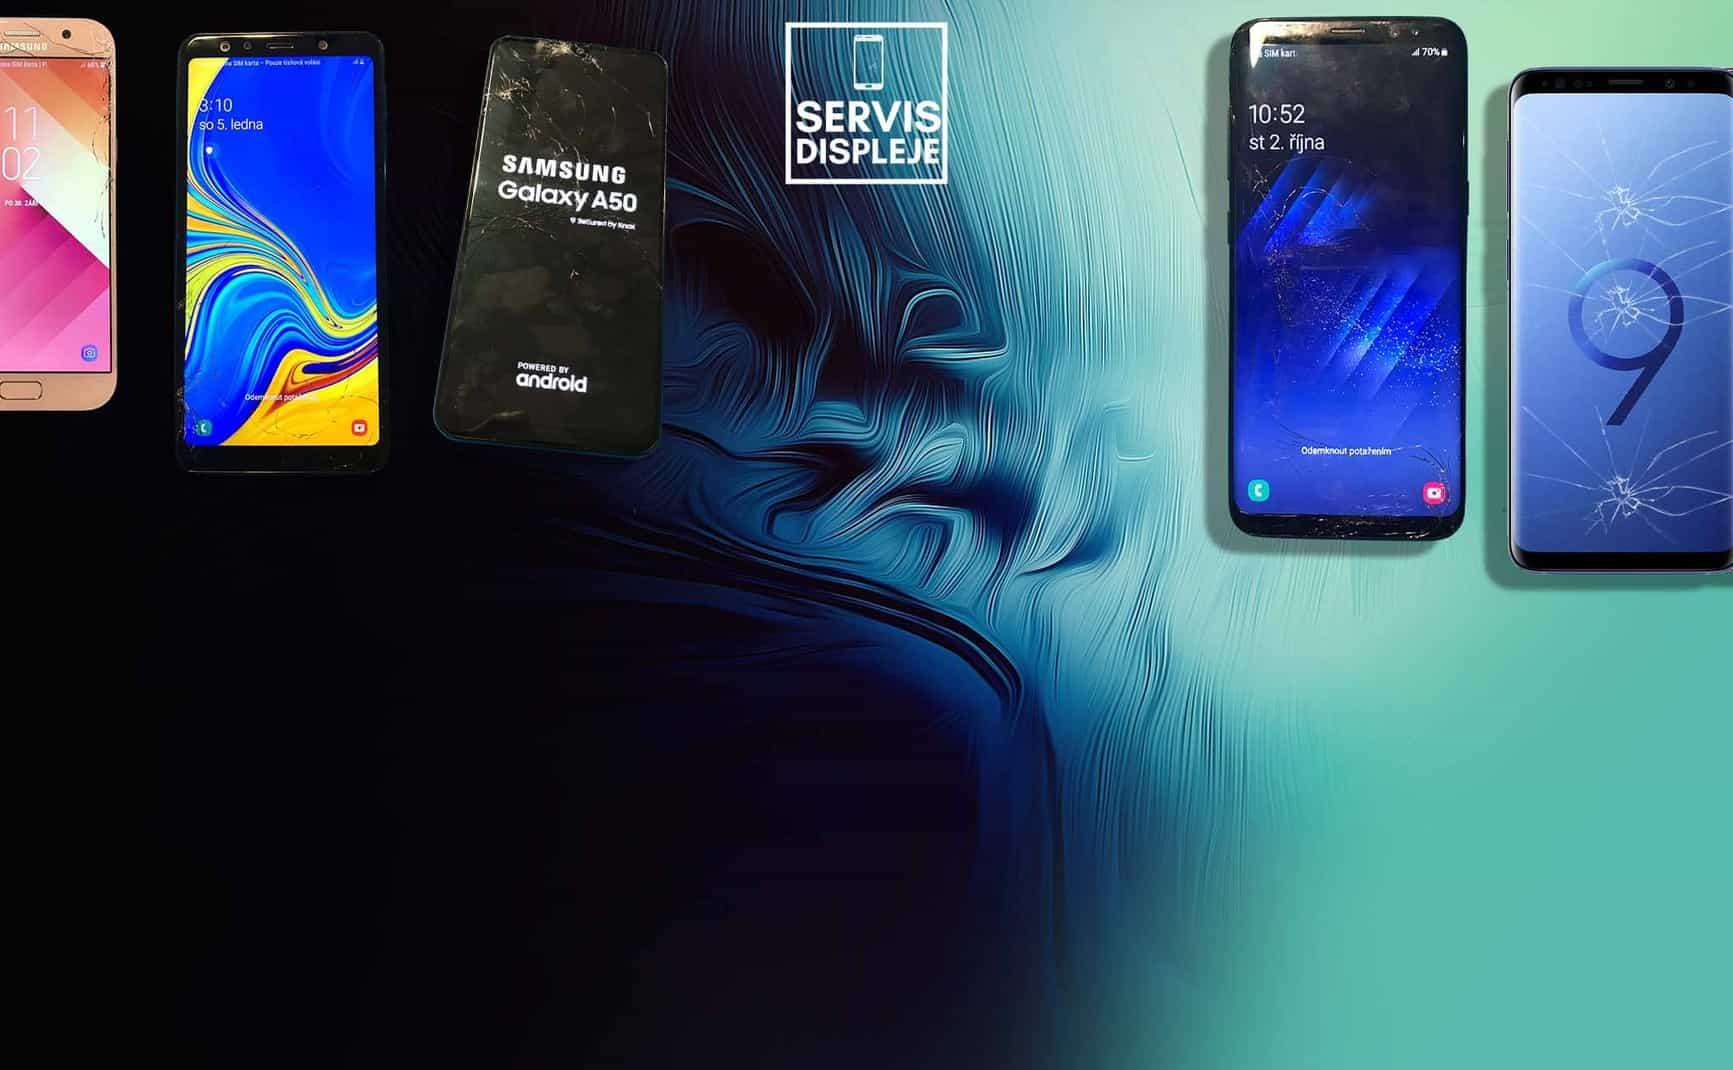 servisdispleje - výměna skla displeje - repasování displeje Samsung